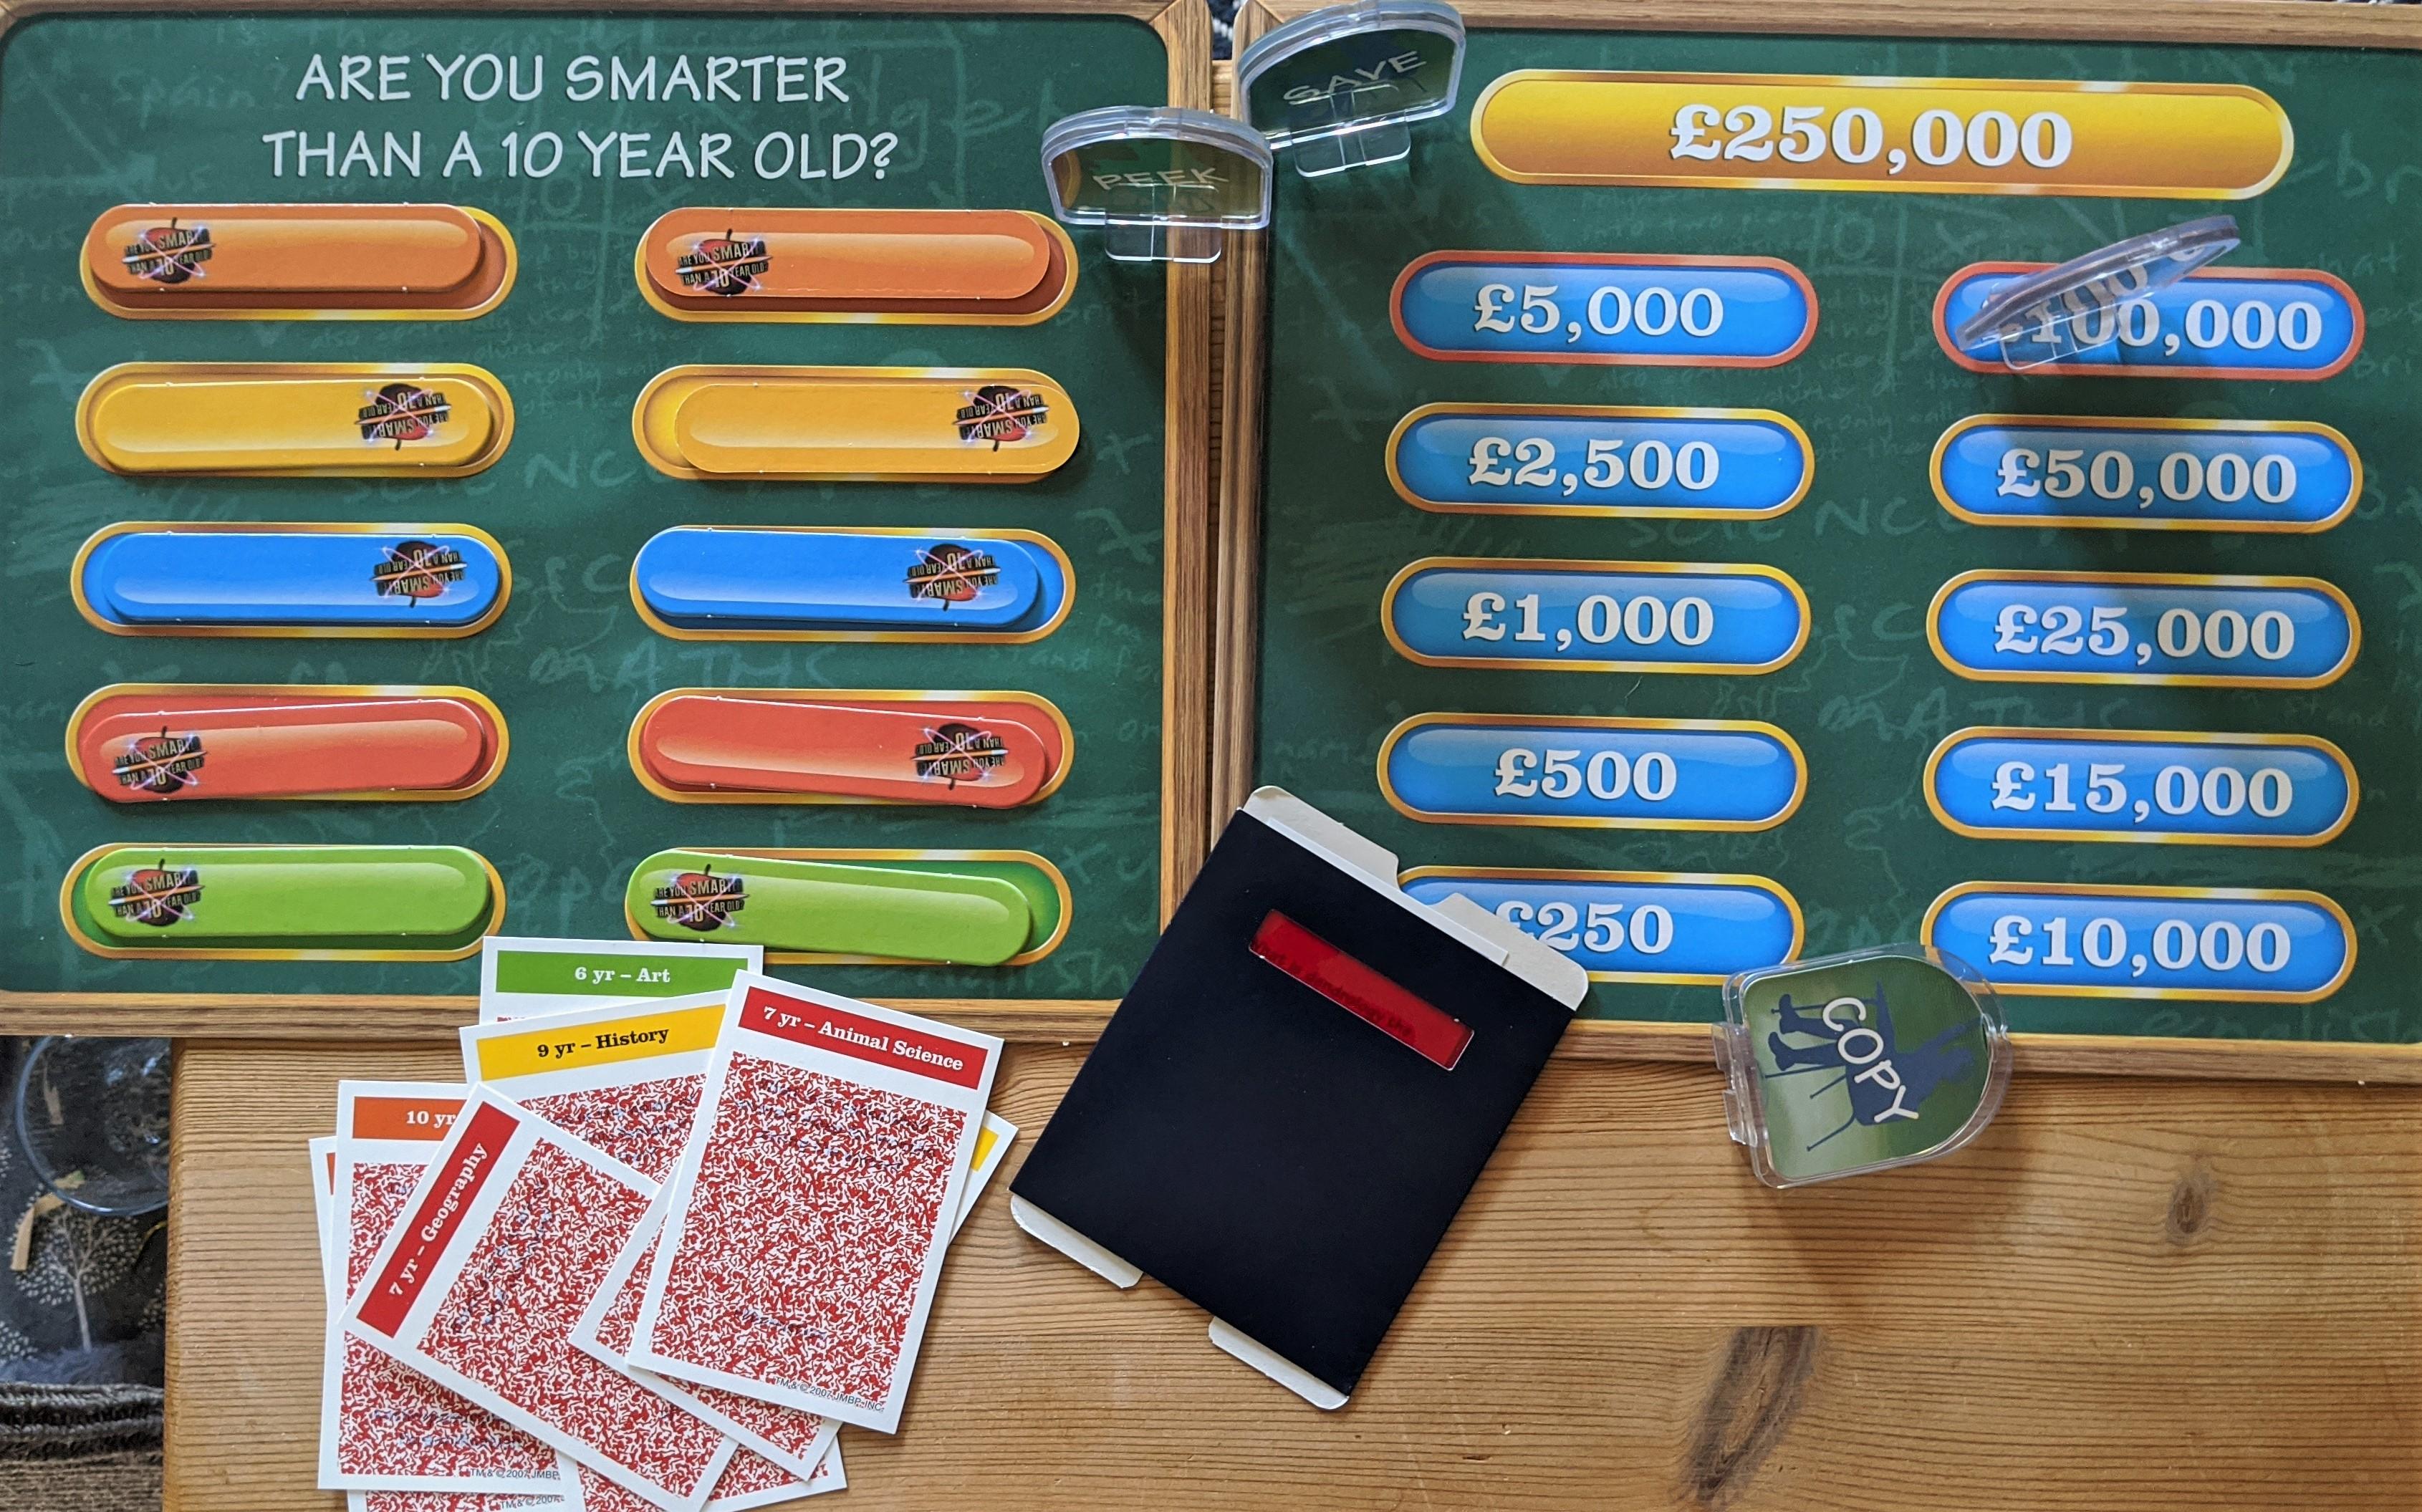 AYSTA10YO Board Game